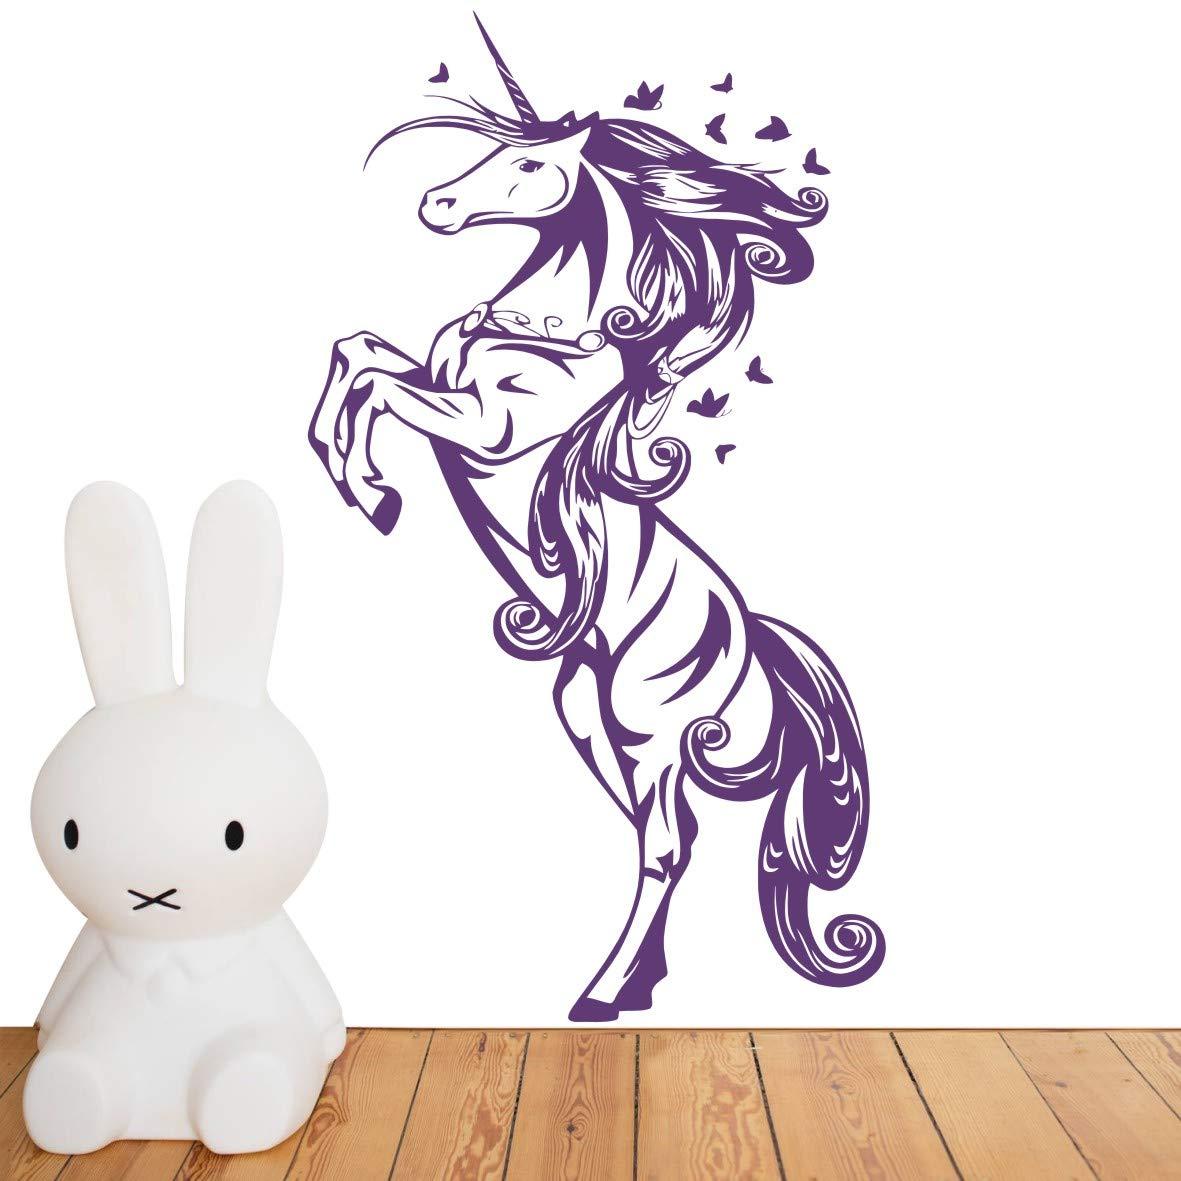 Beautiful Stand Unicorn Wall Decal,Art Removable Kids Nursery Bedroom Butterflies Unicorn Horse Wall Sticker,Baby Room Decoration Home Decor Wall Decor ES-43 (Violet, 55X97CM) YOYOYU